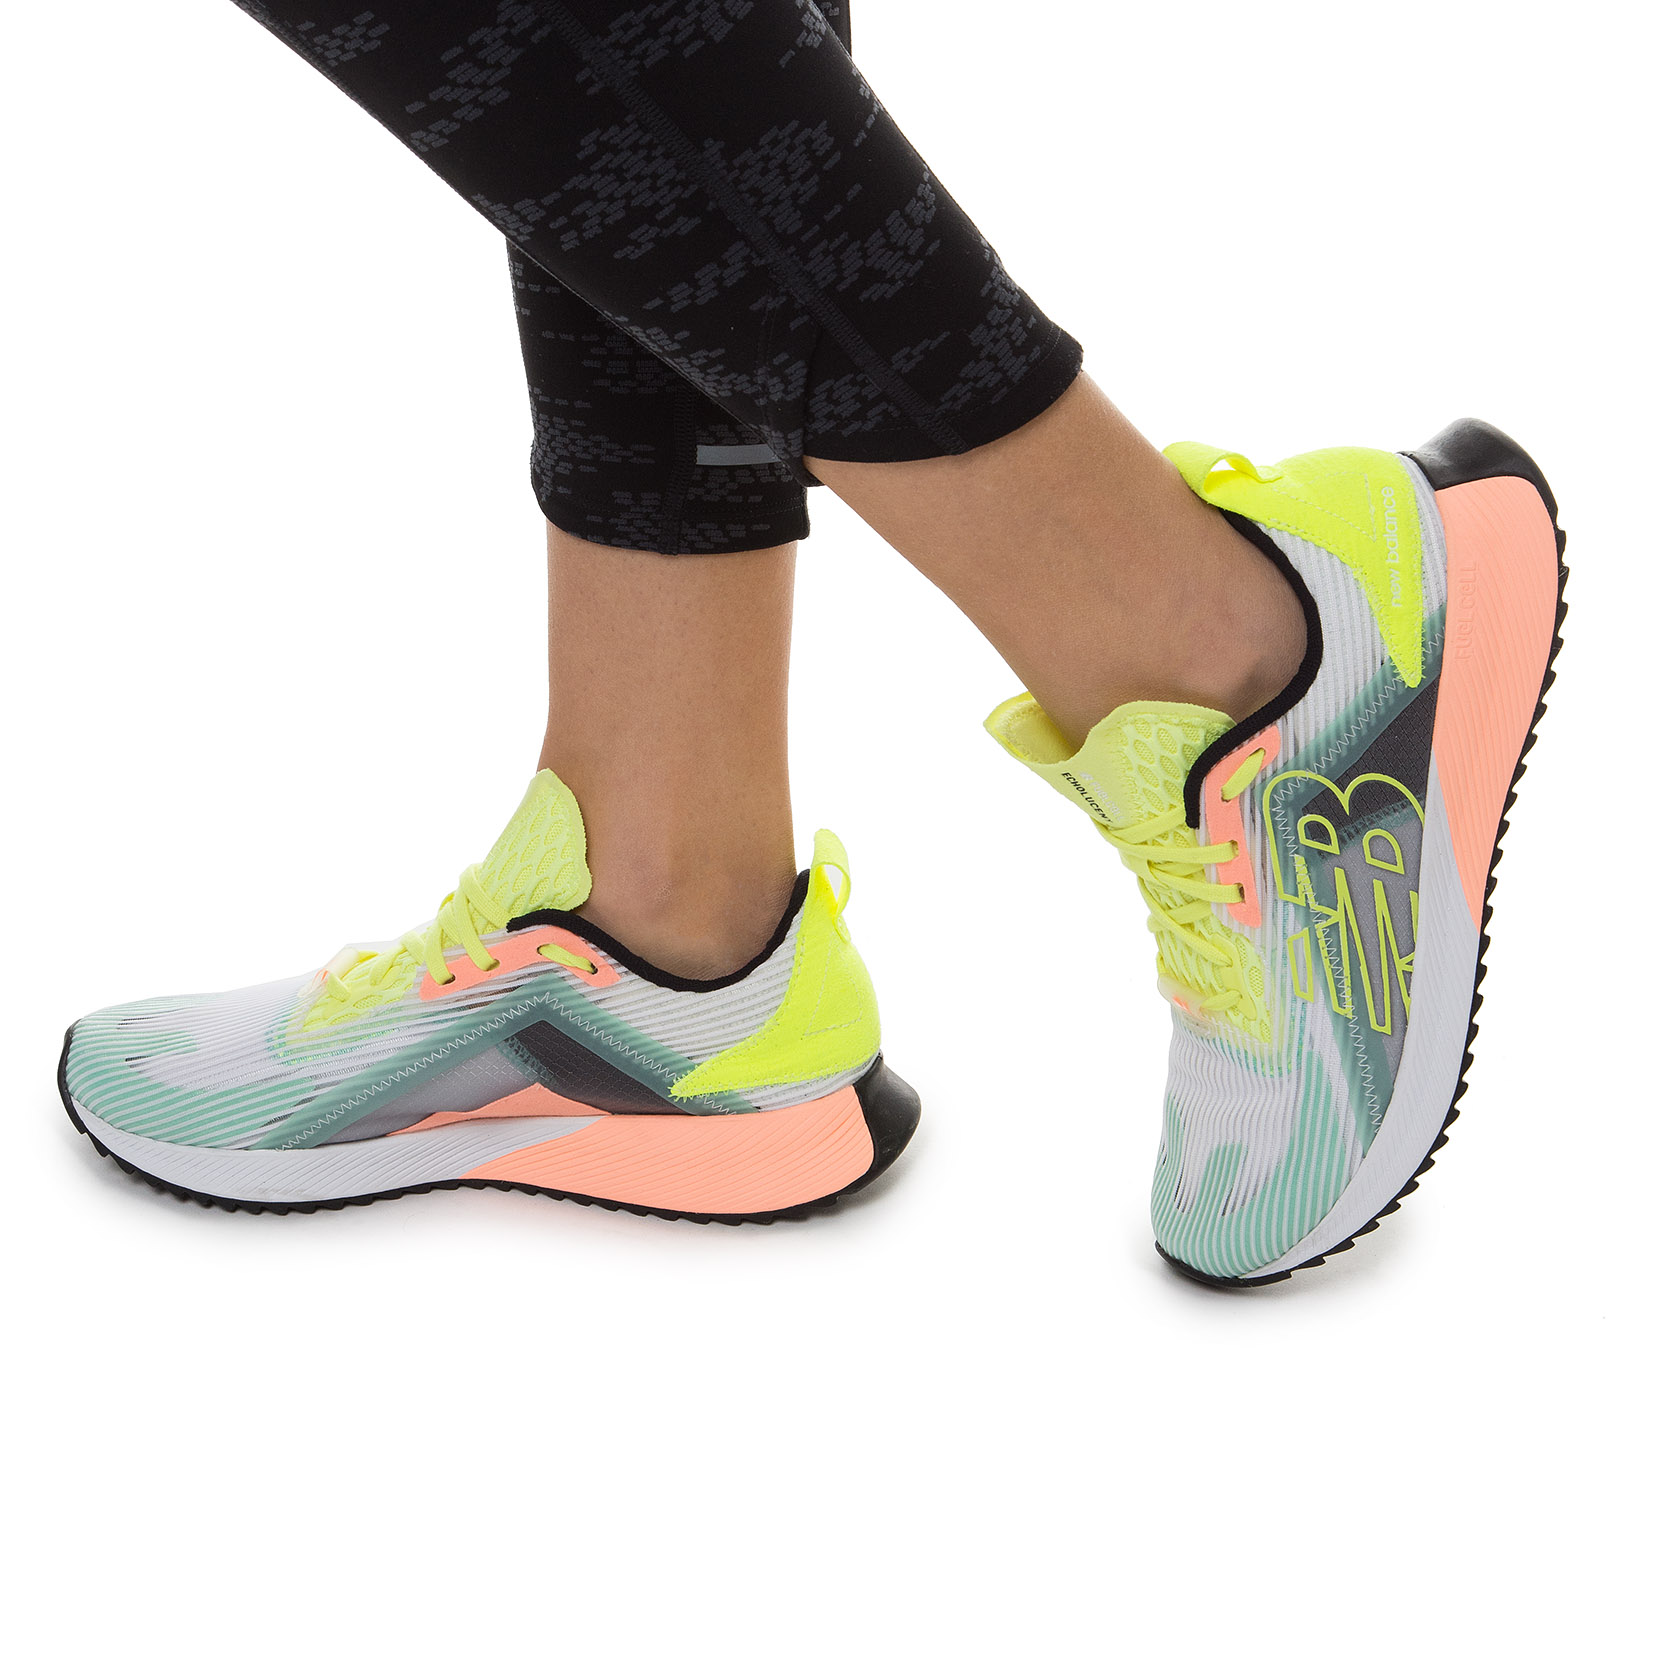 Жіноче взуття для бігу Fuel Cell Echo Echolucent WFCELLM | New Balance